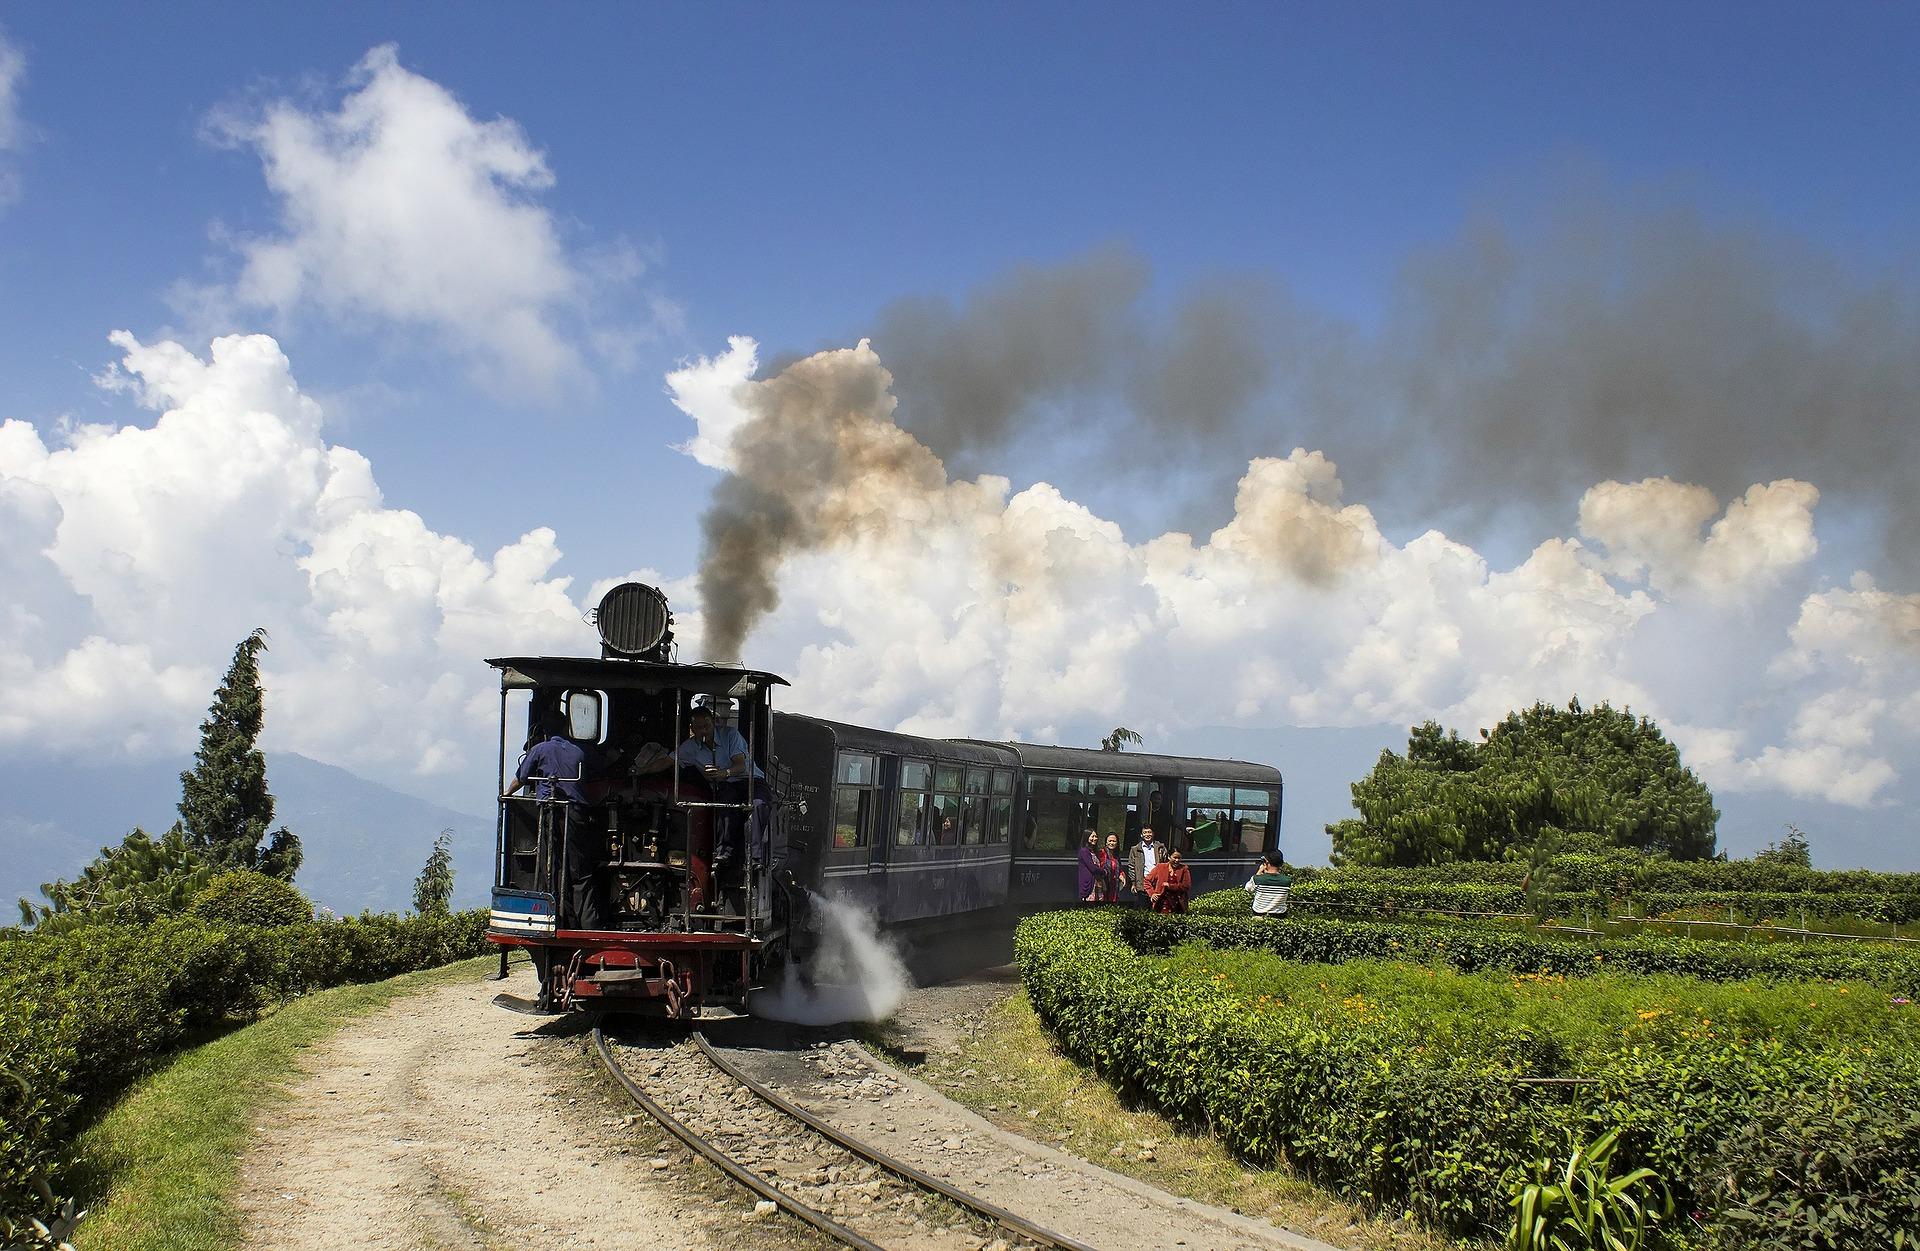 Toy Train Darjeeling India